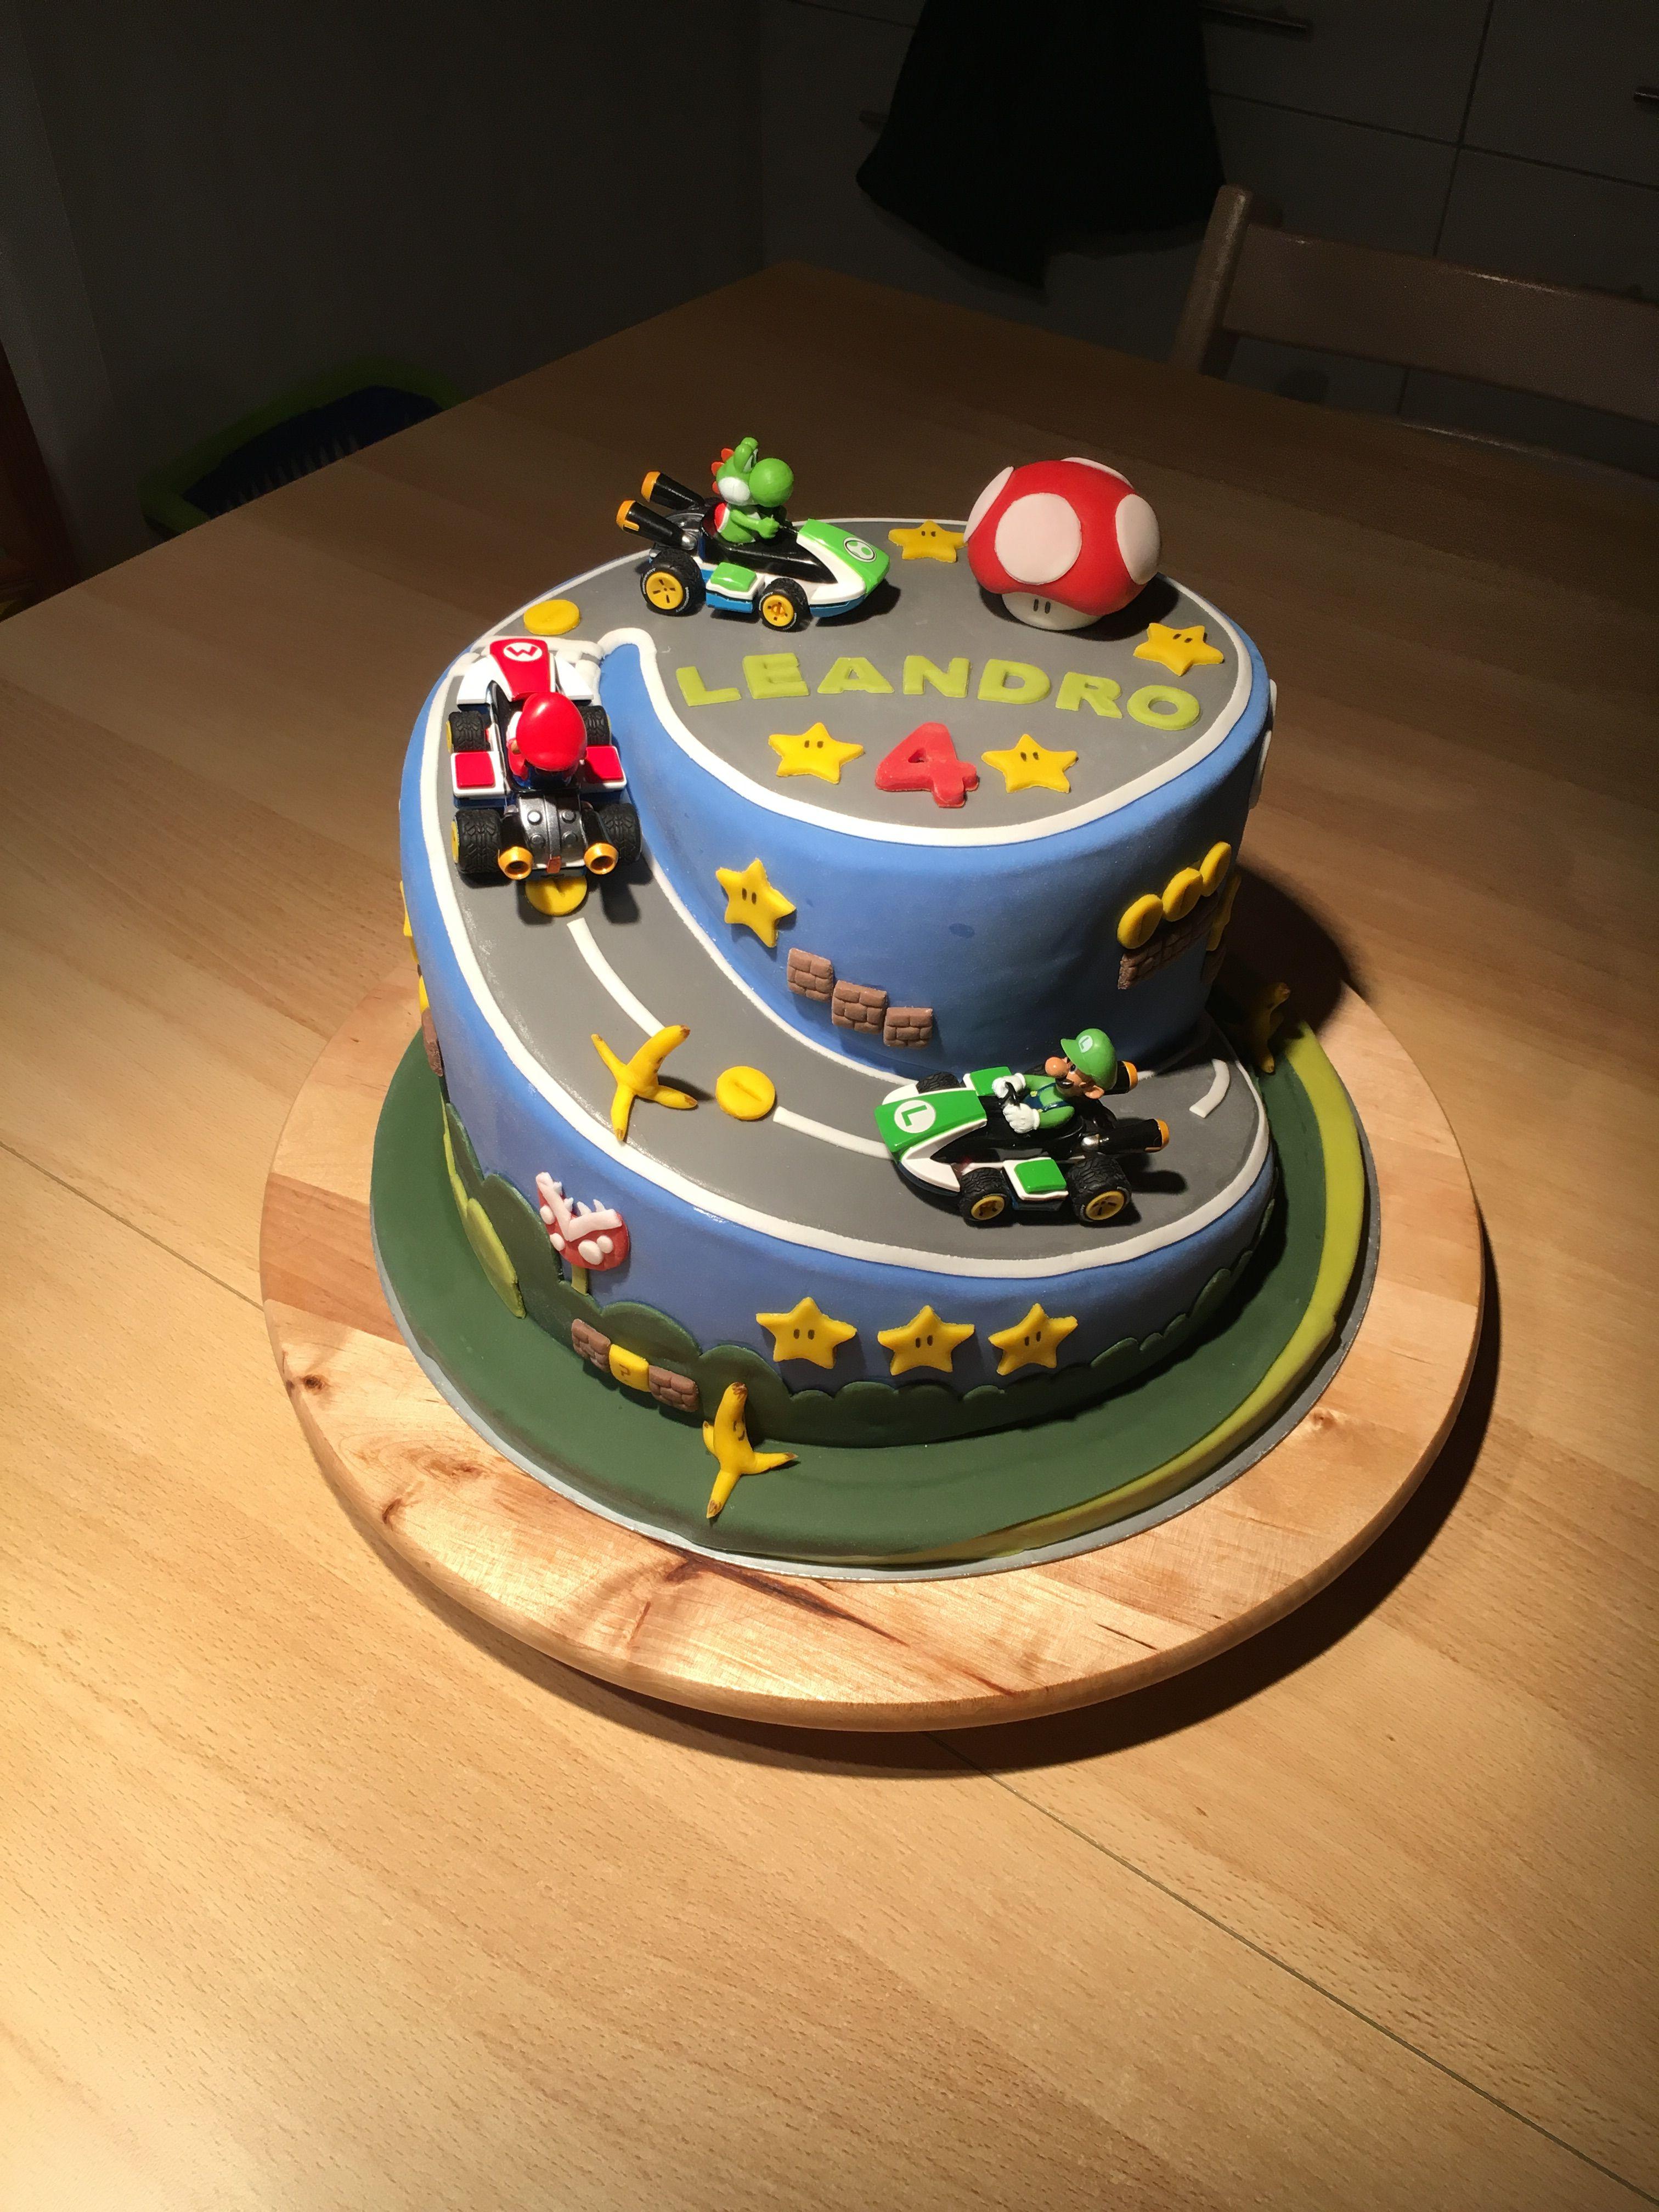 Super Mario Torte Geburtstagstorte Mario Kart Super Mario Torte Motivtorten Geburtstagstorte